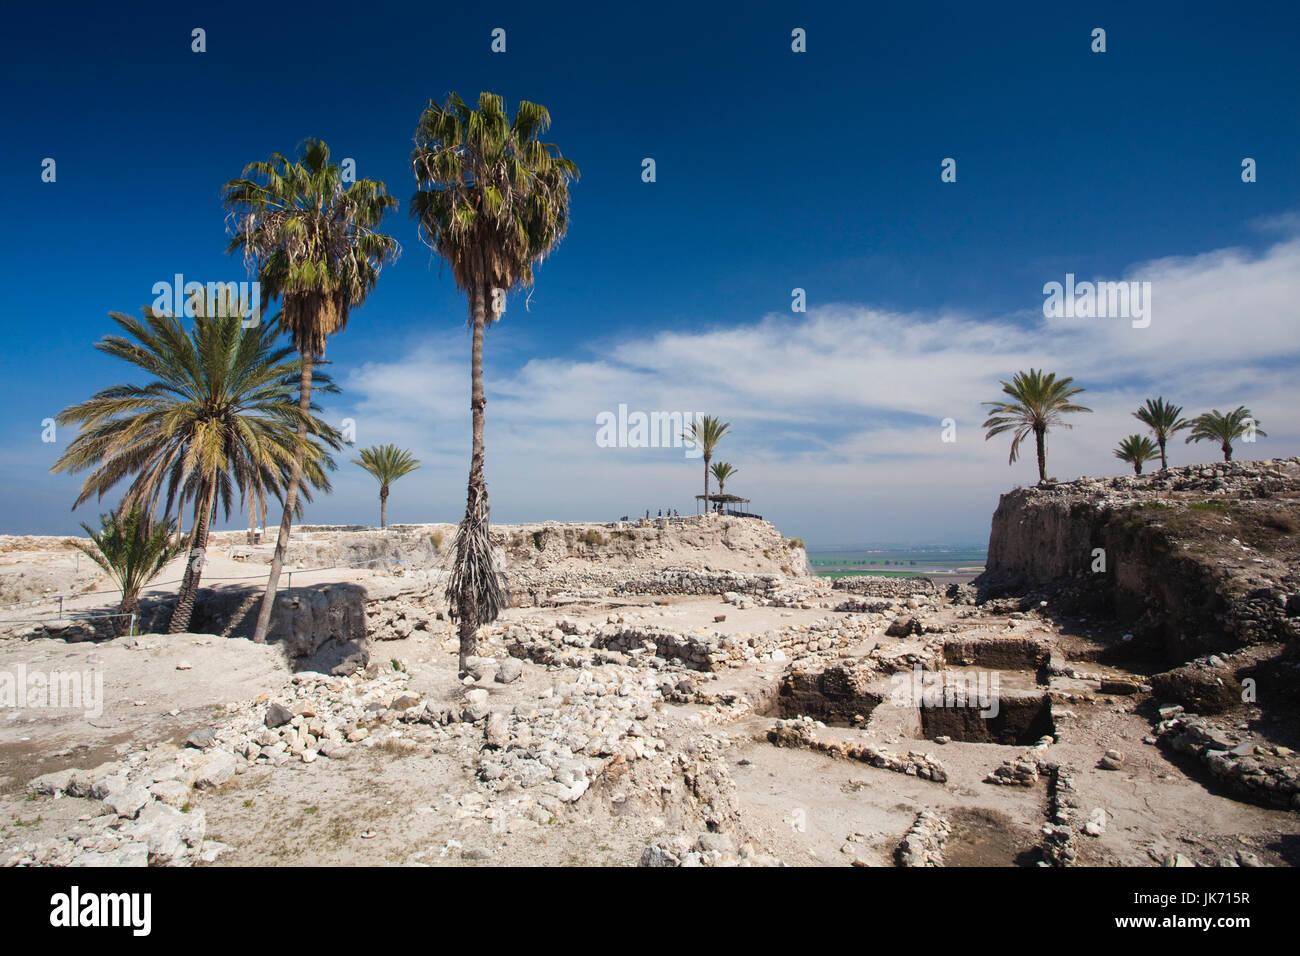 Israel, North Coast, Megiddo, Megiddo National Park, also known as Armageddon, ruins of ancient city - Stock Image